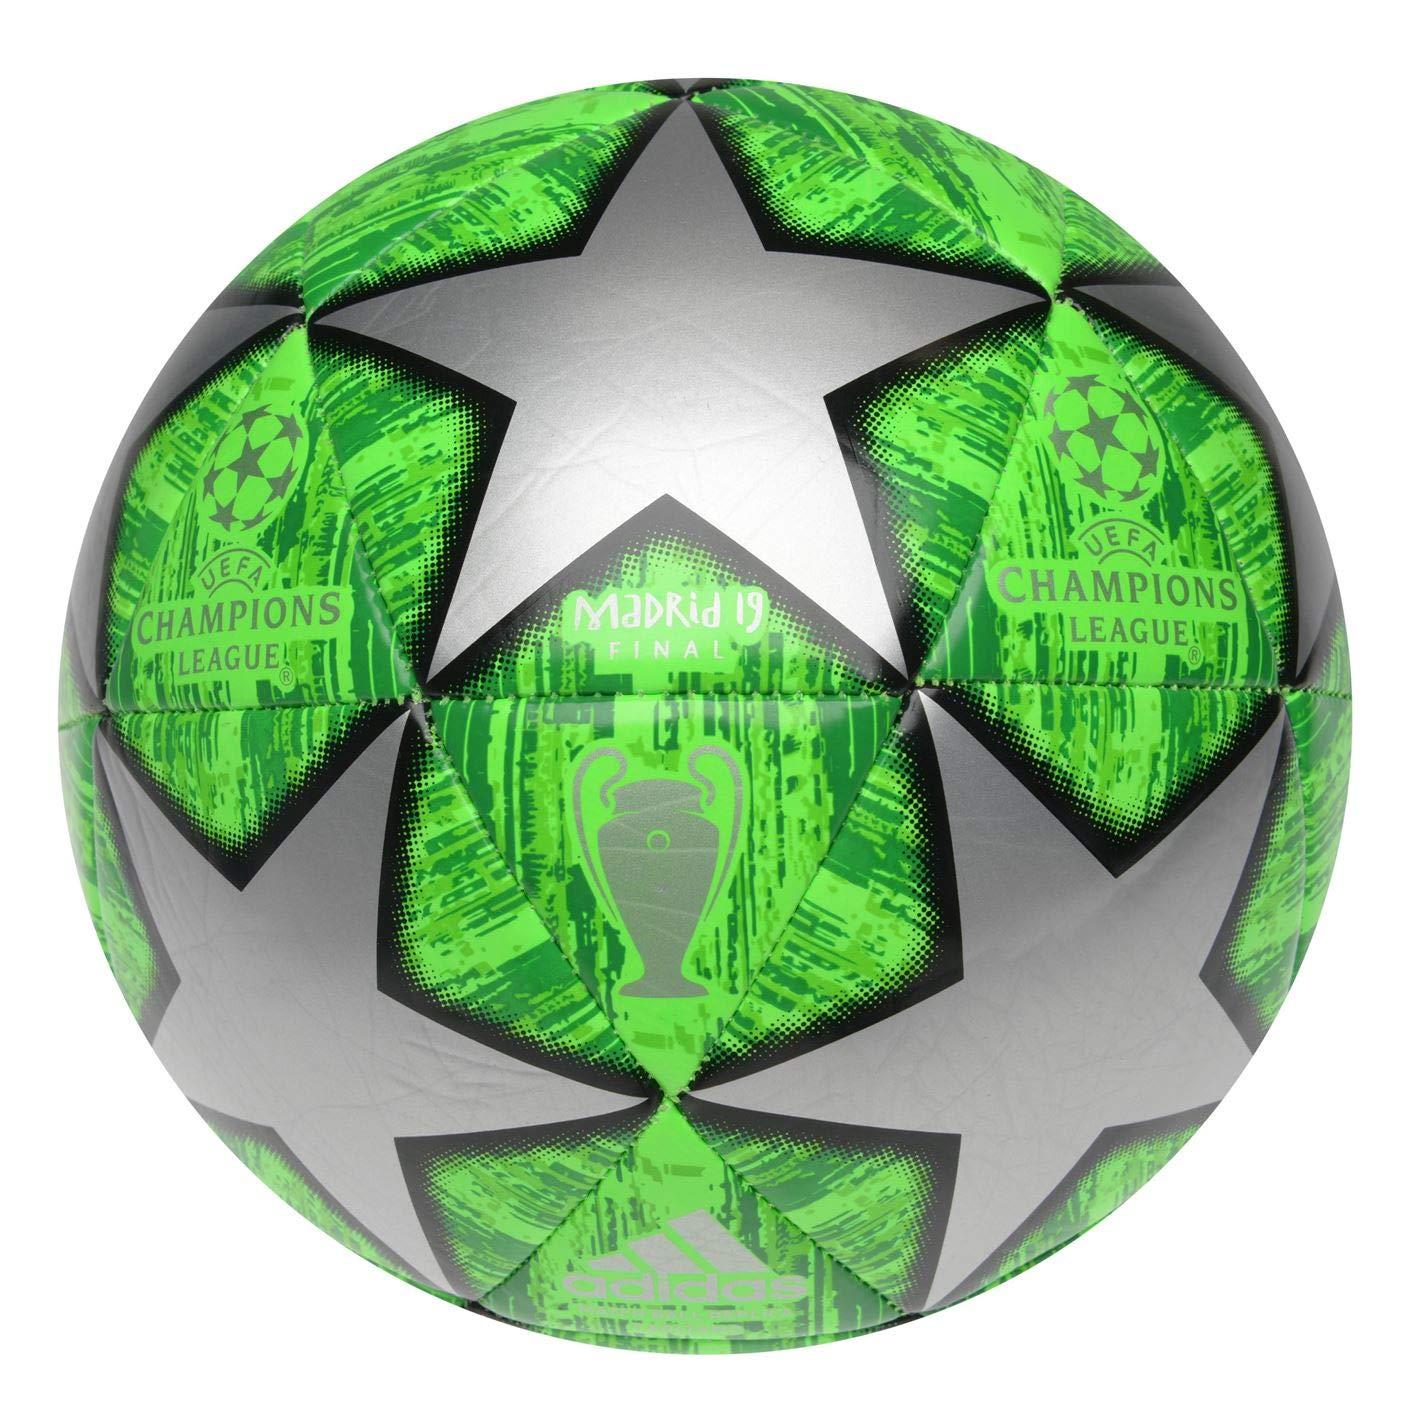 Champions League Madrid Final Football